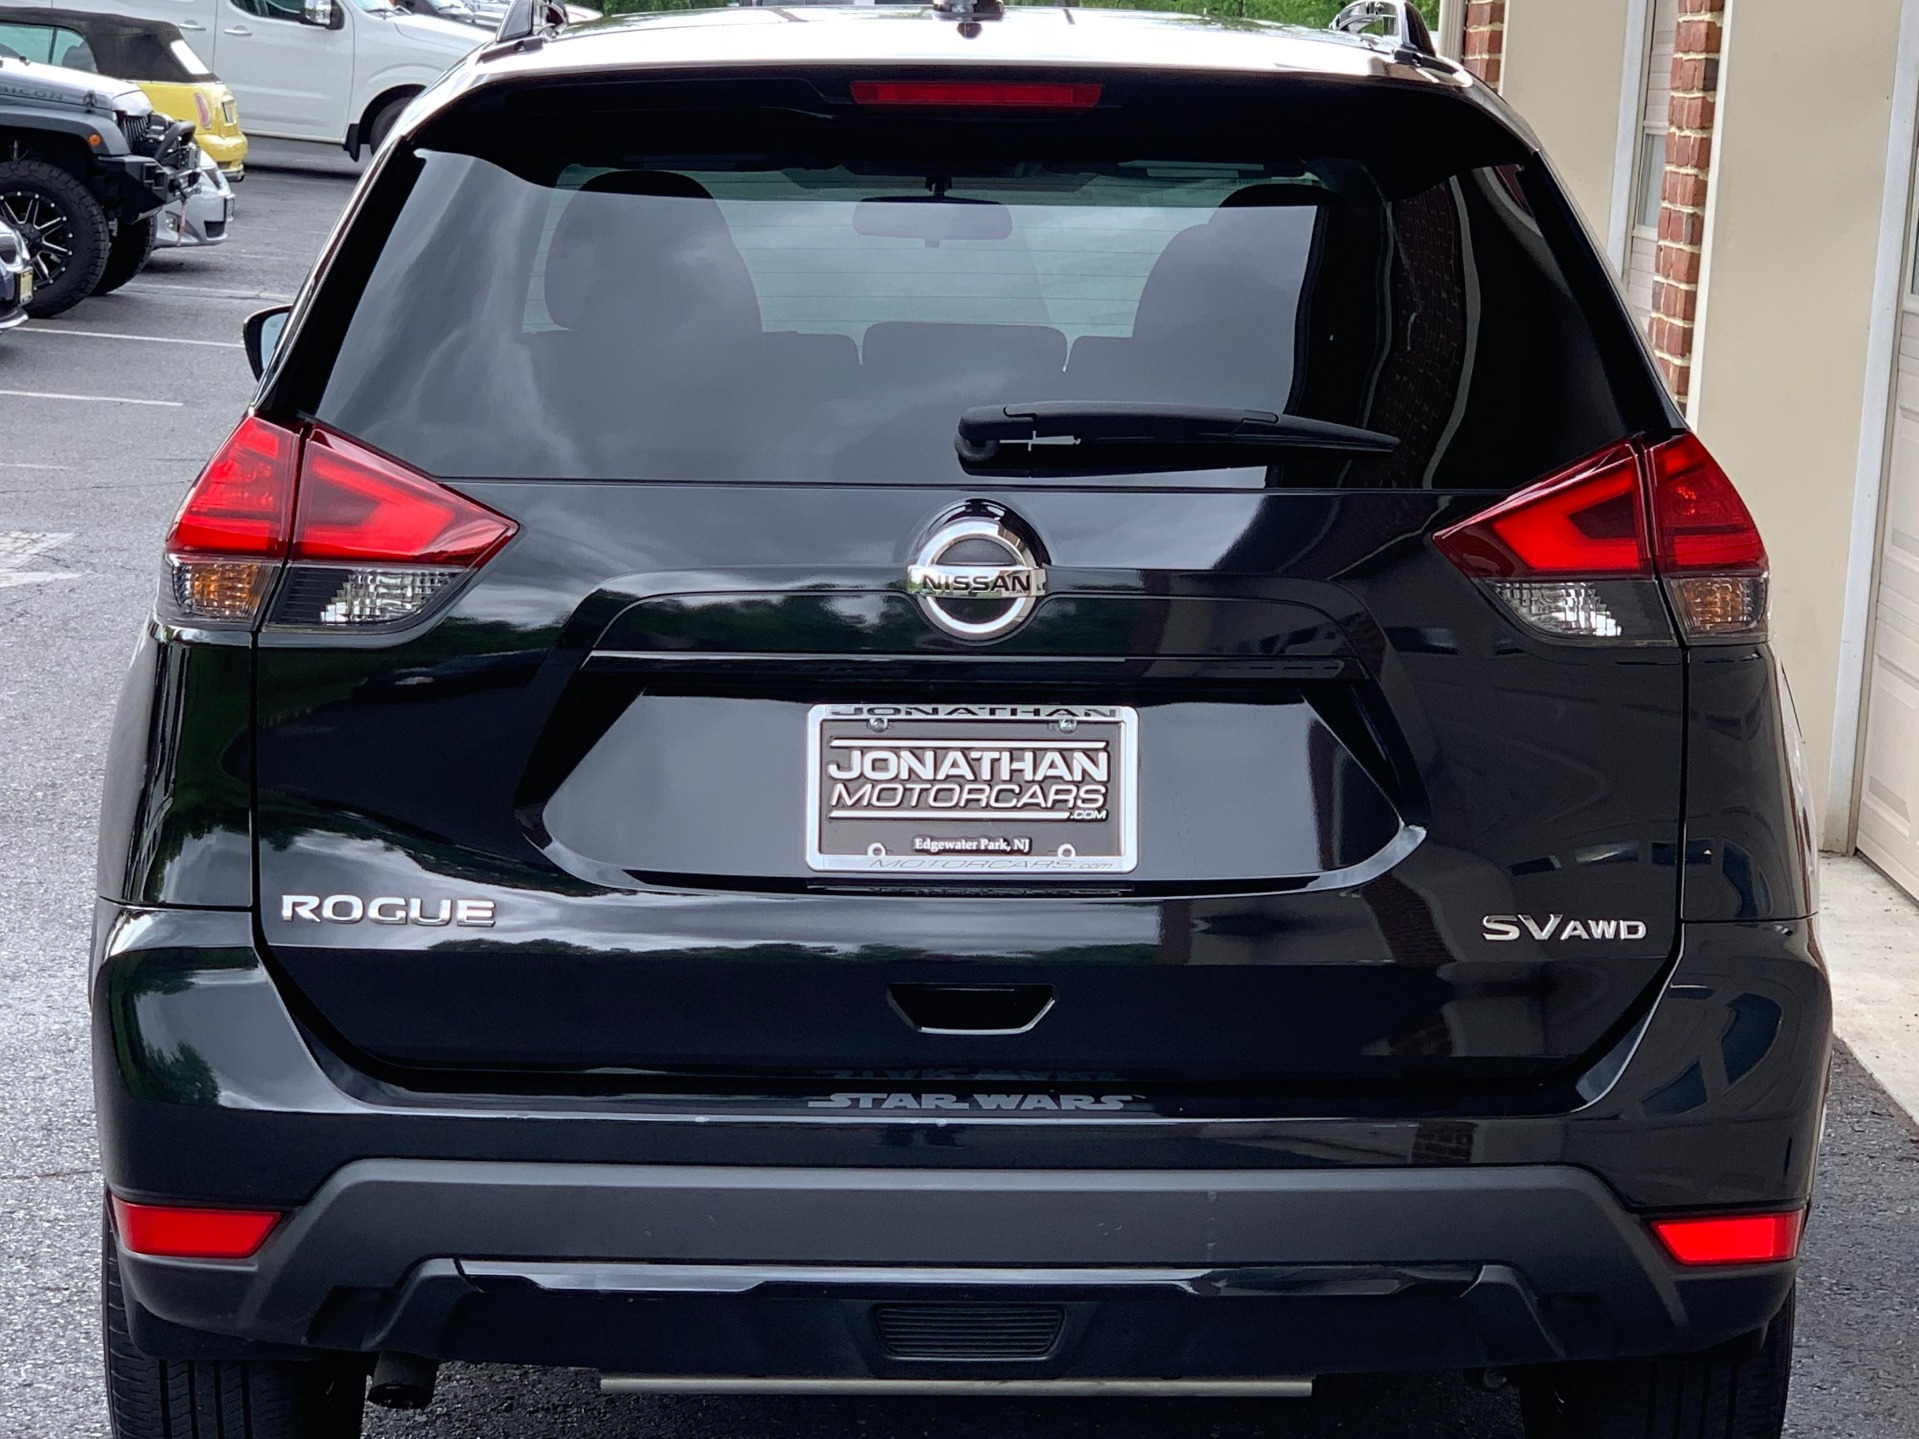 Used-2017-Nissan-Rogue-SV-Star-Wars-Edition